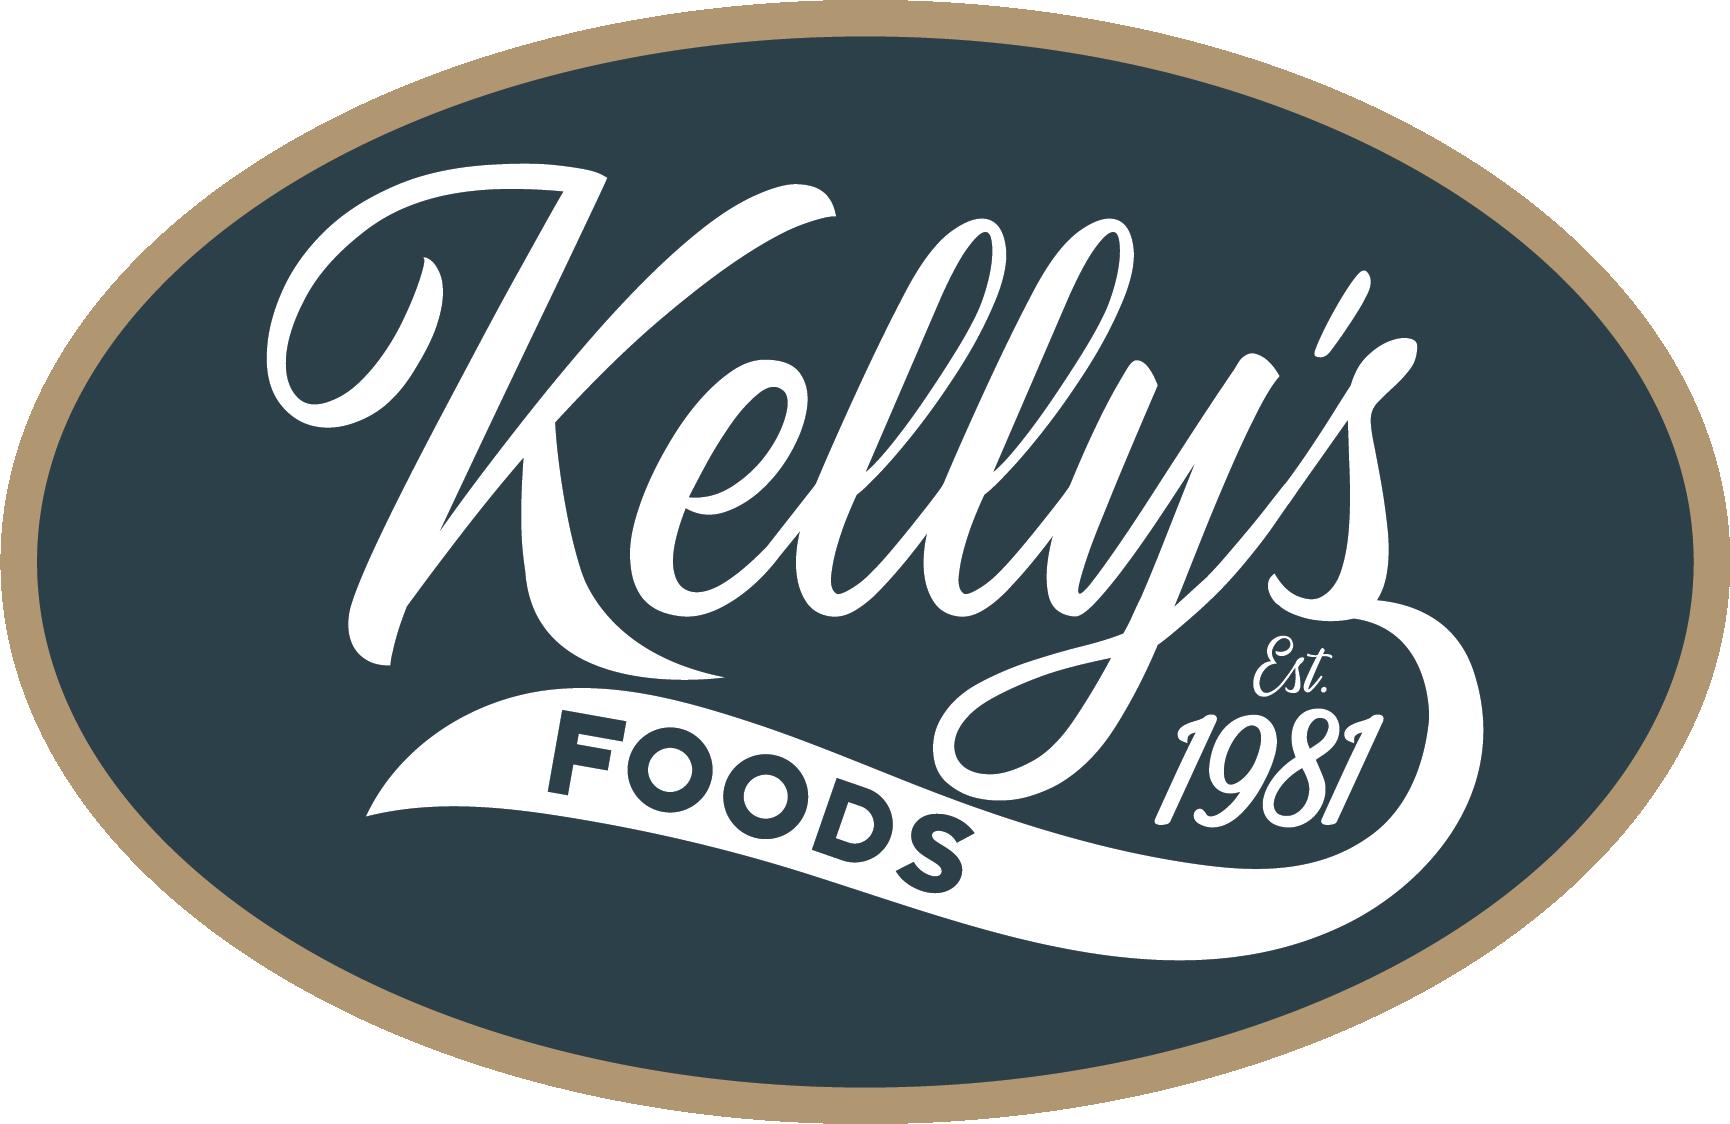 Kelly's Foods